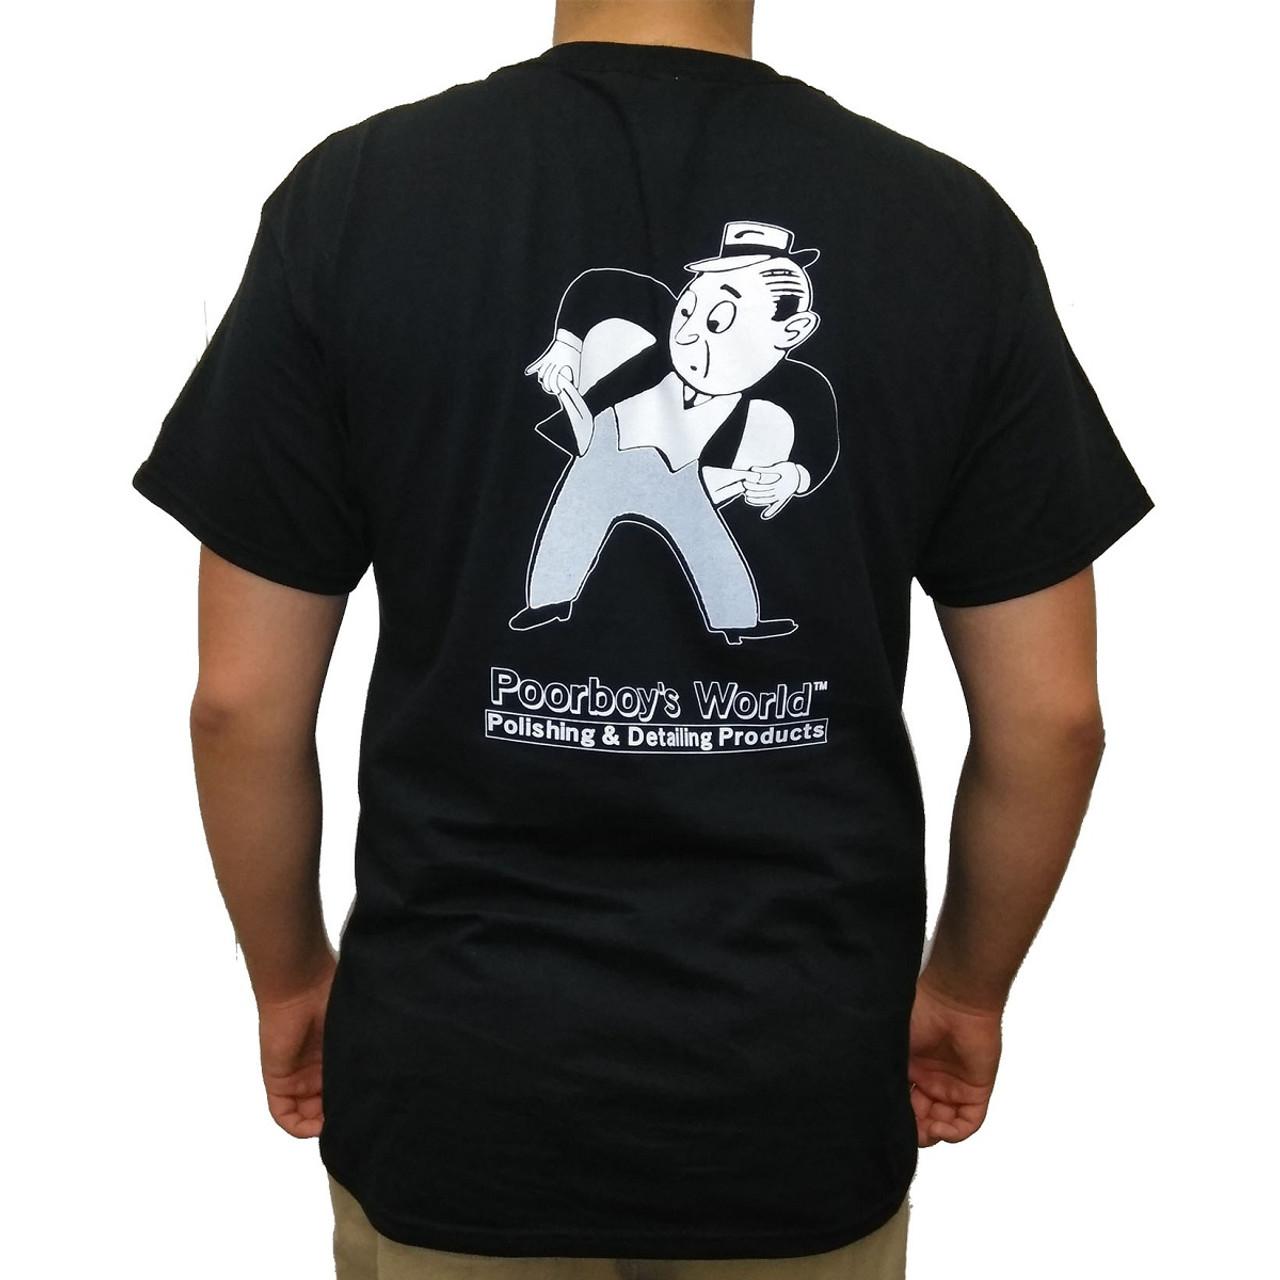 Poorboy's World Black T-Shirt w/ Pocket - 3XL - Back